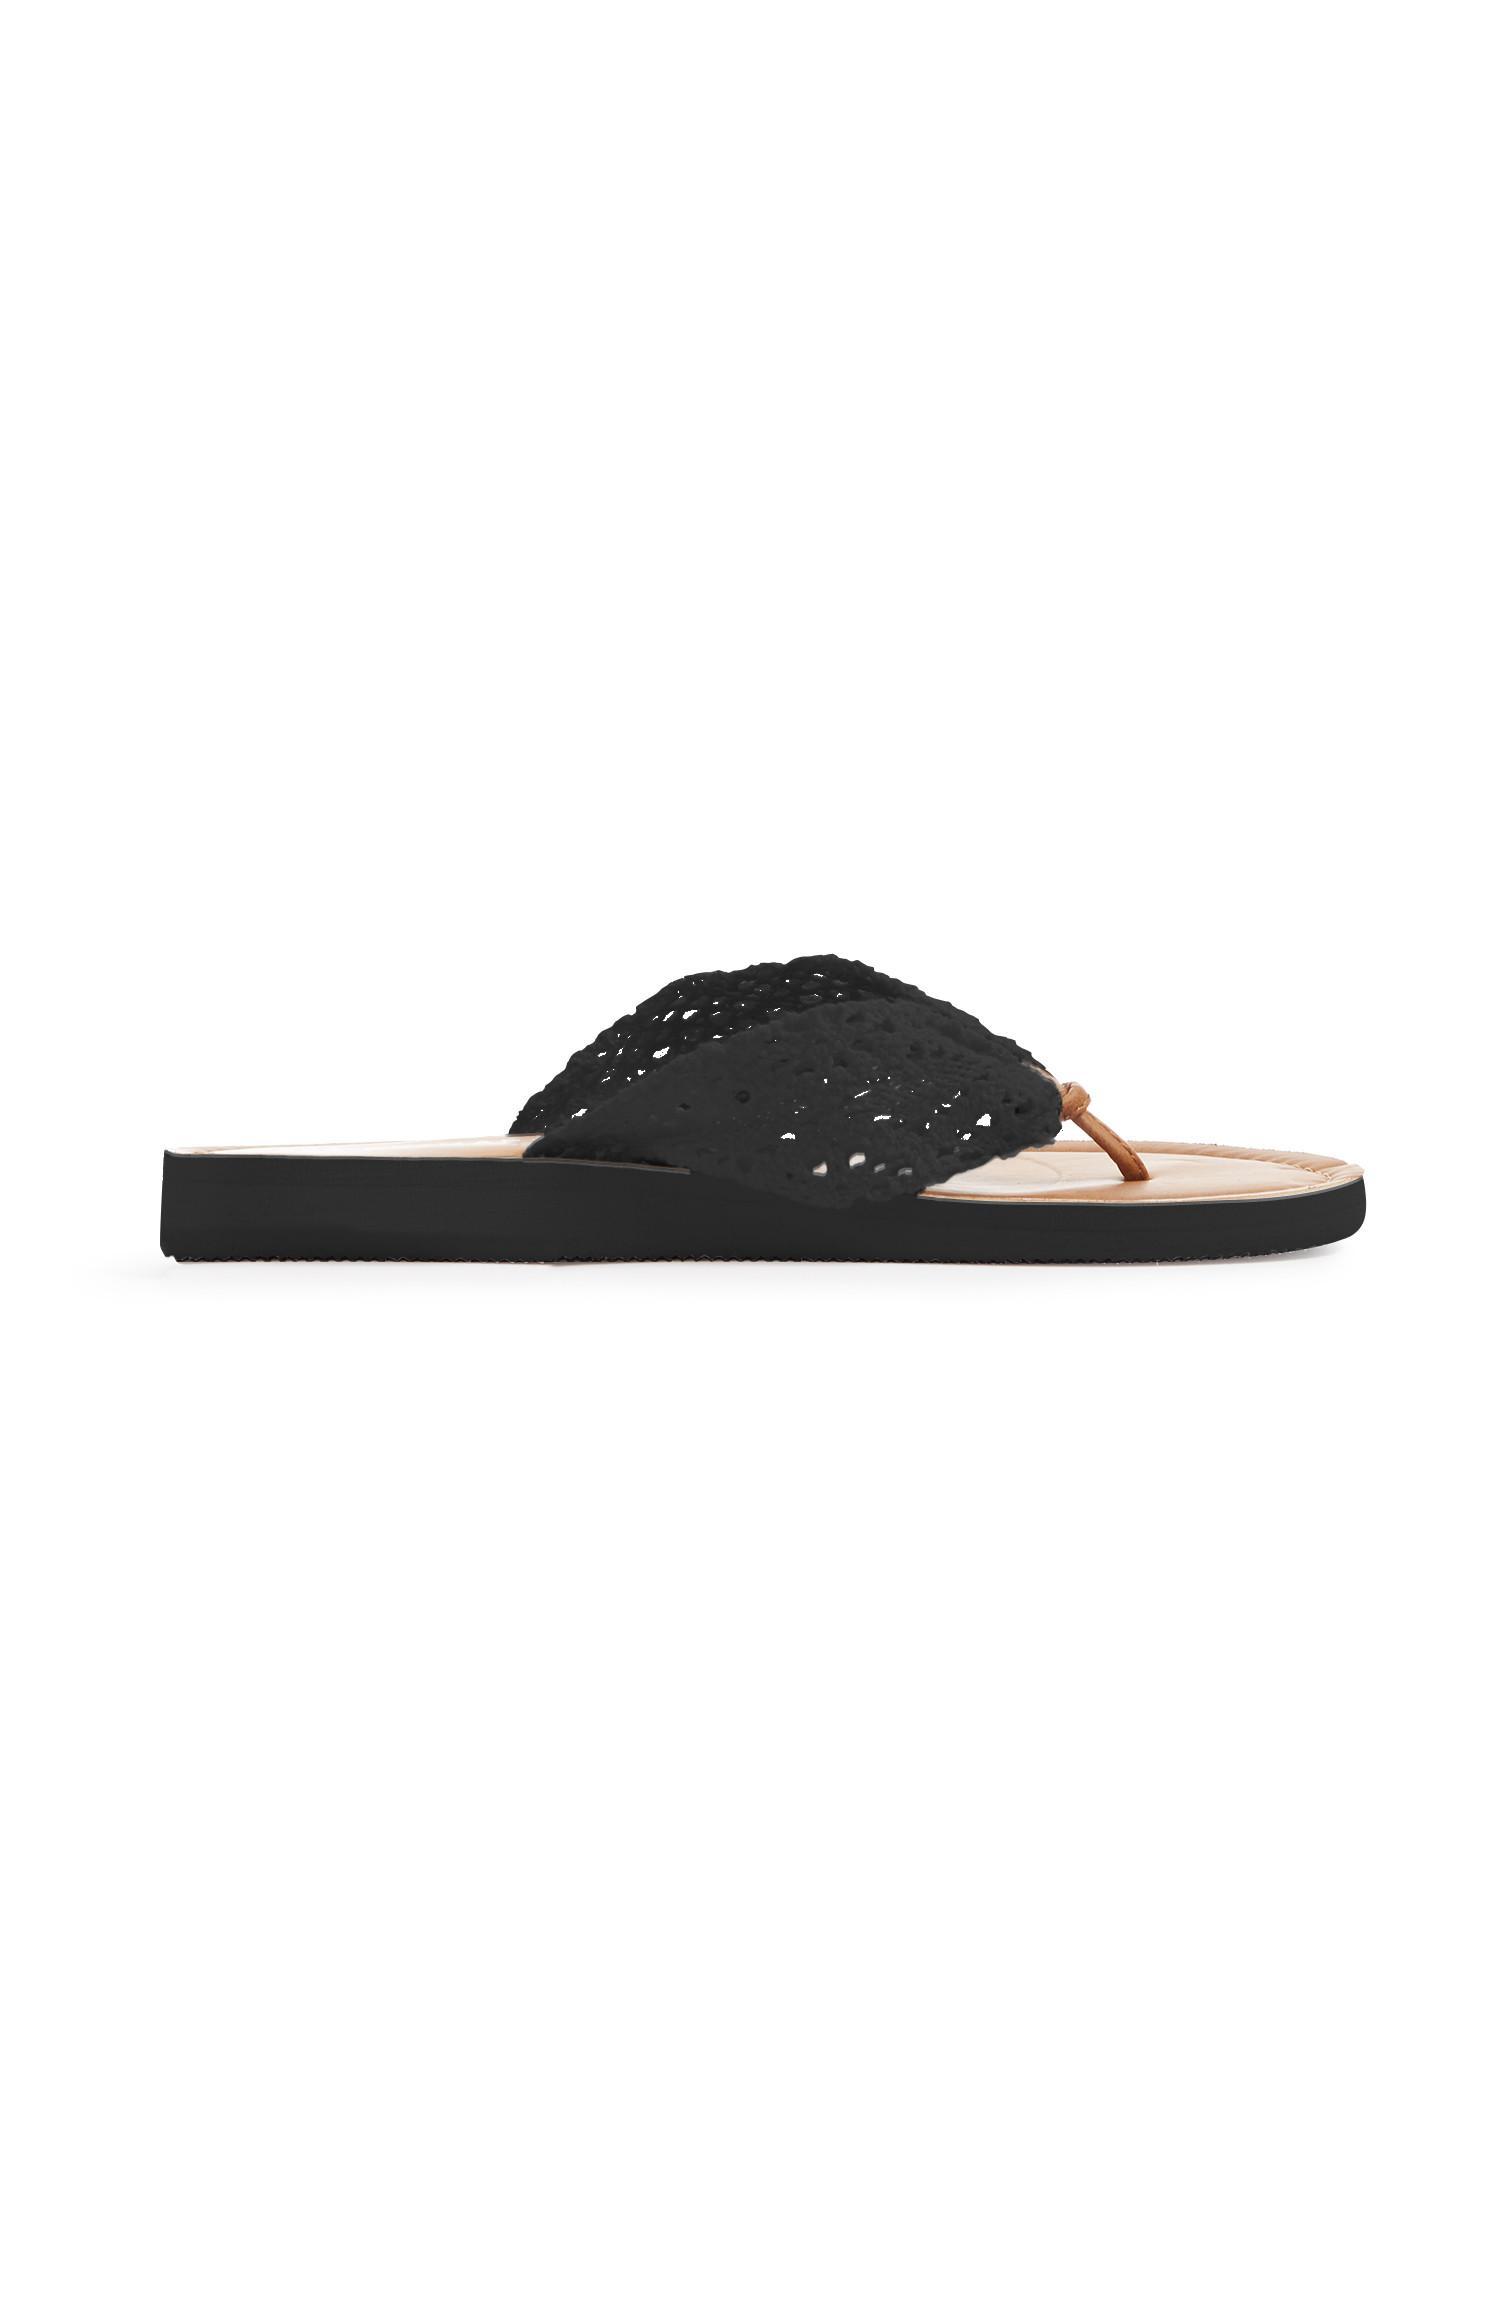 Black Crochet Flip Flop